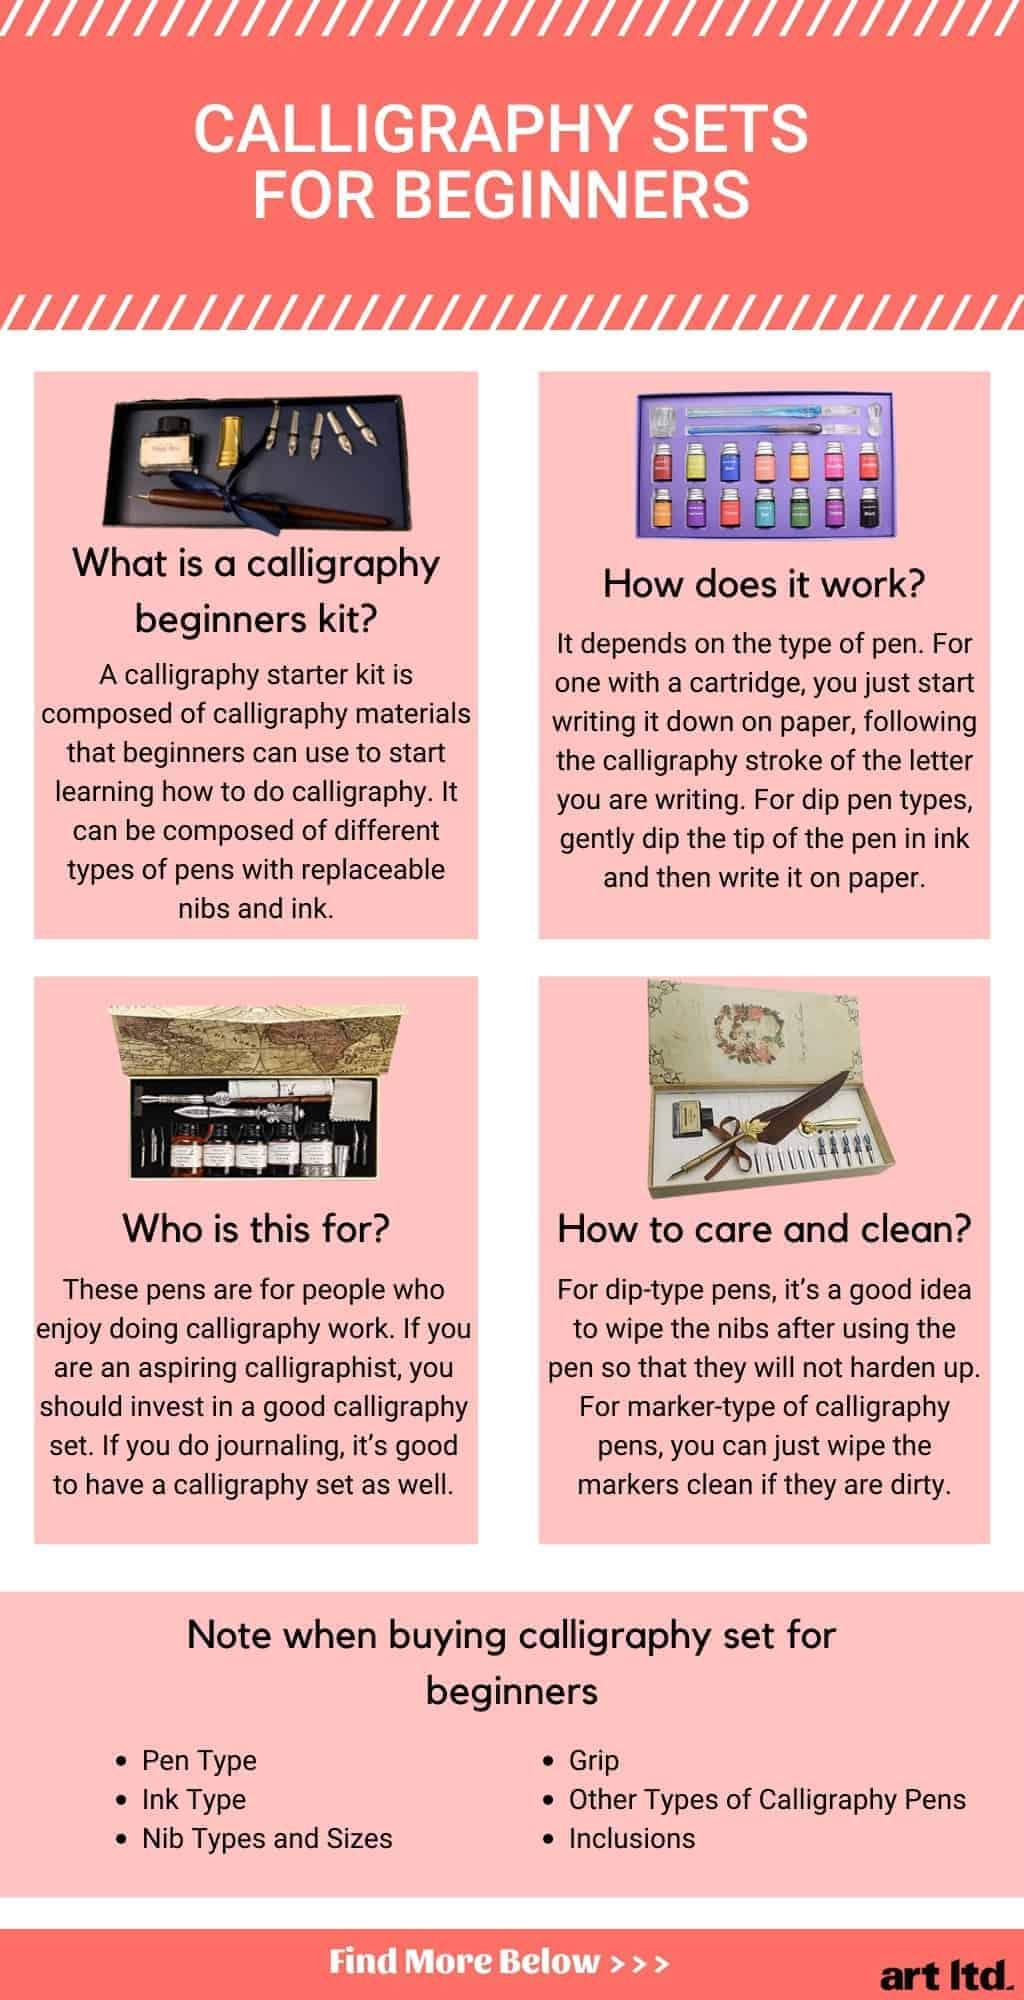 calligraphy-kit-for-beginners